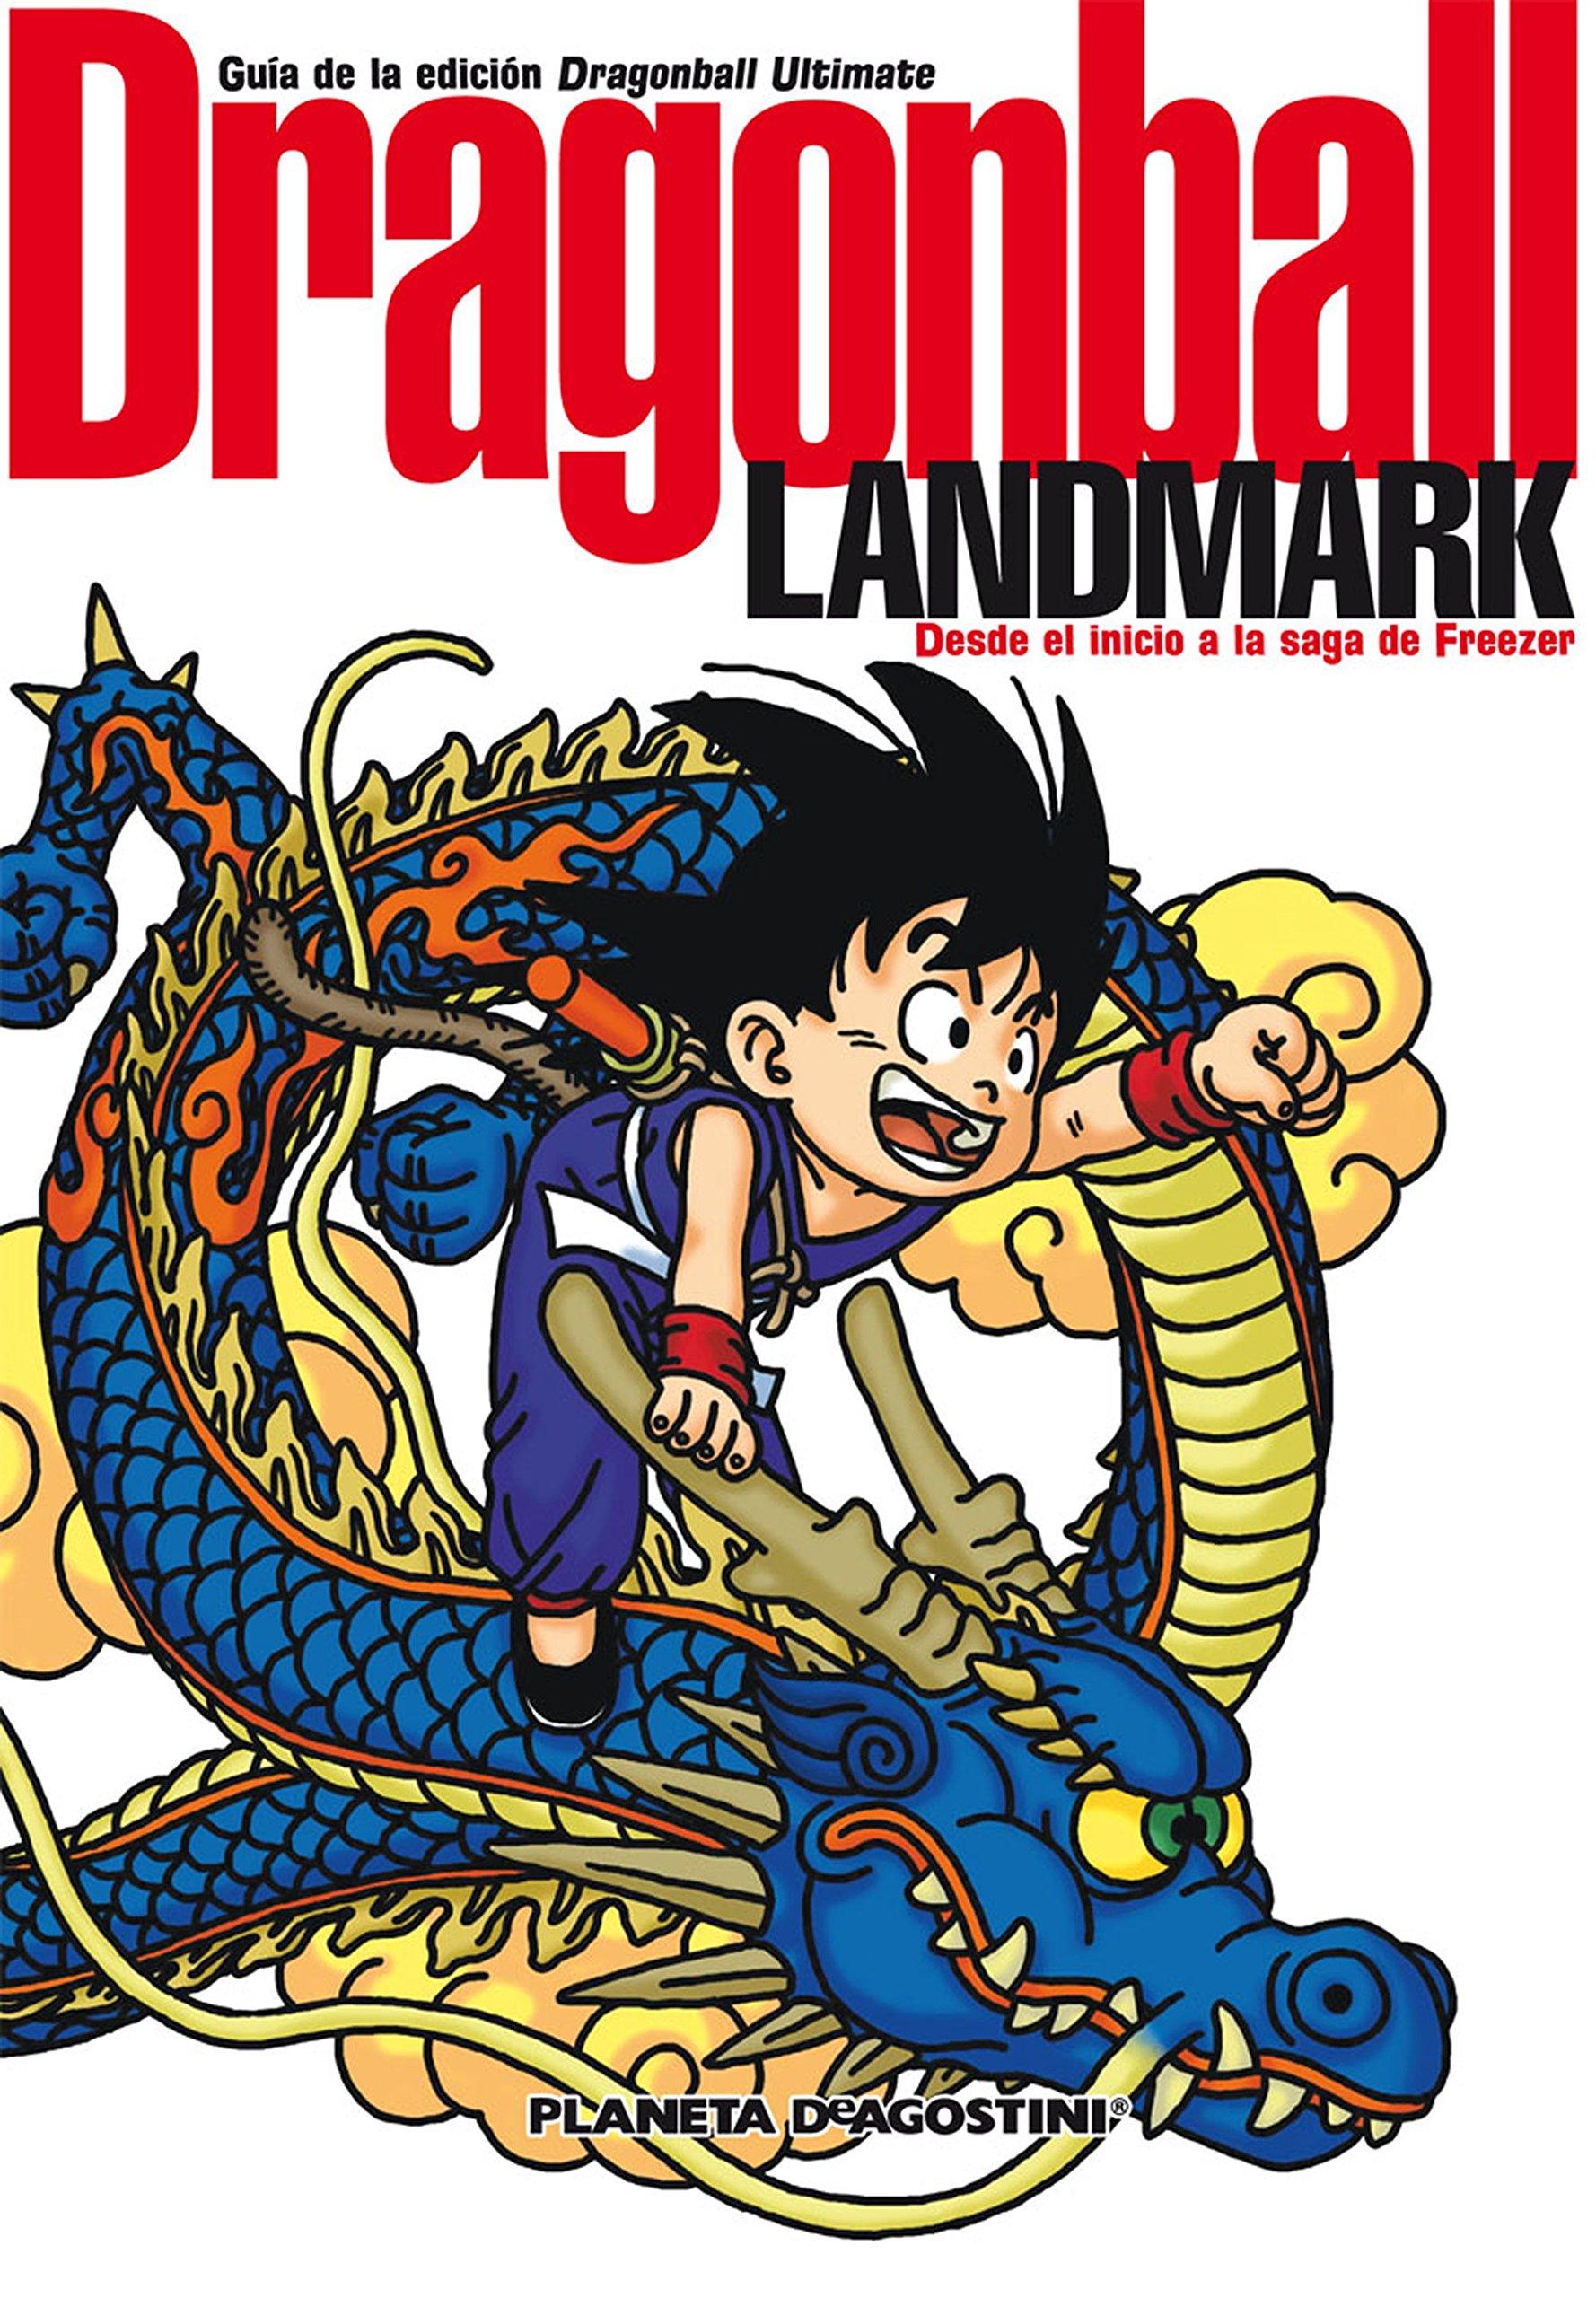 Dragon Ball Landmark (Manga Shonen): Amazon.es: Toriyama, Akira: Libros